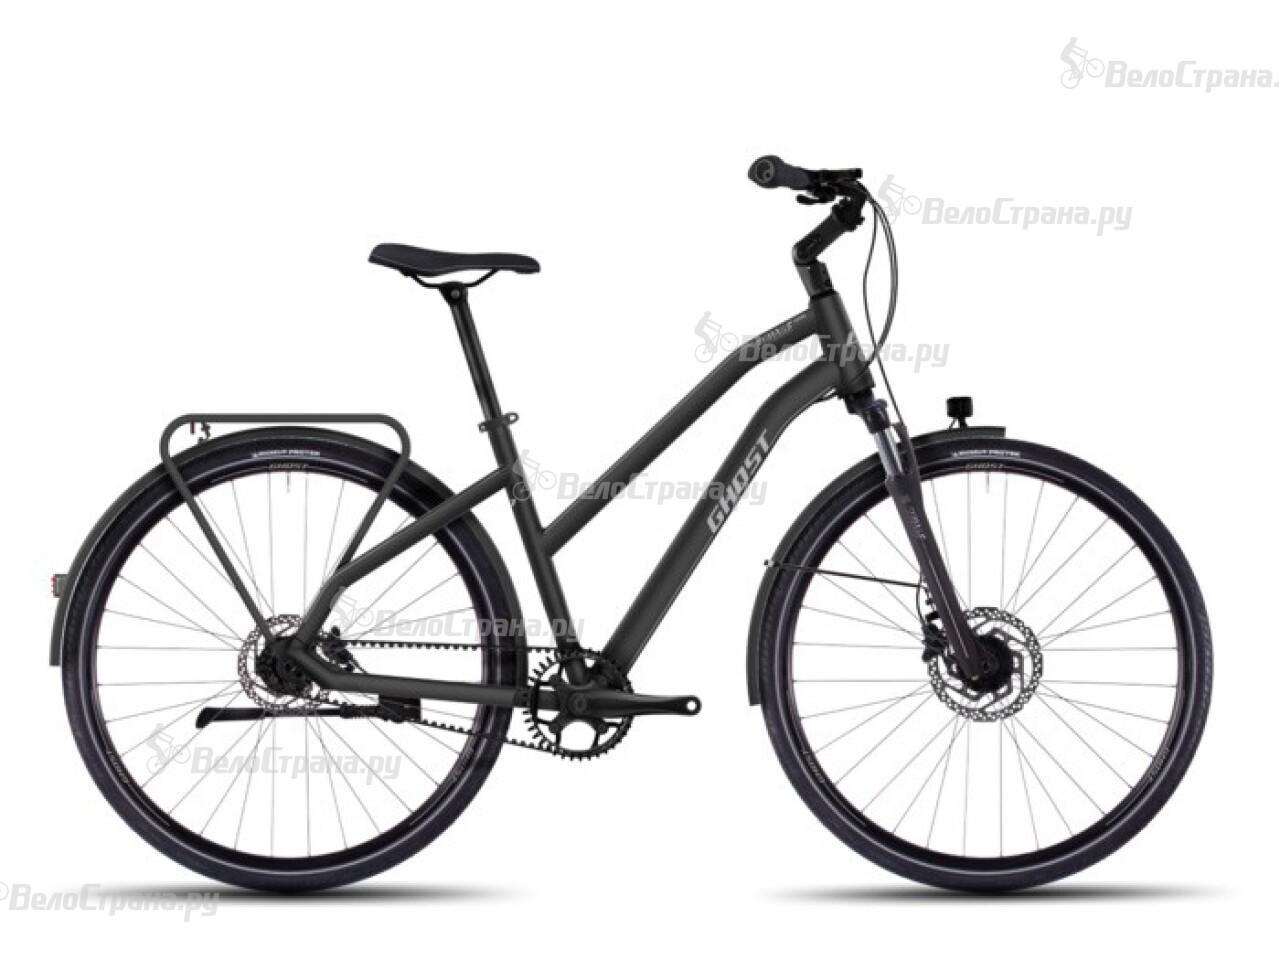 Велосипед Ghost SQUARE Trekking 7 Miss (2016) оборудование для мониторинга m square tpu page 7